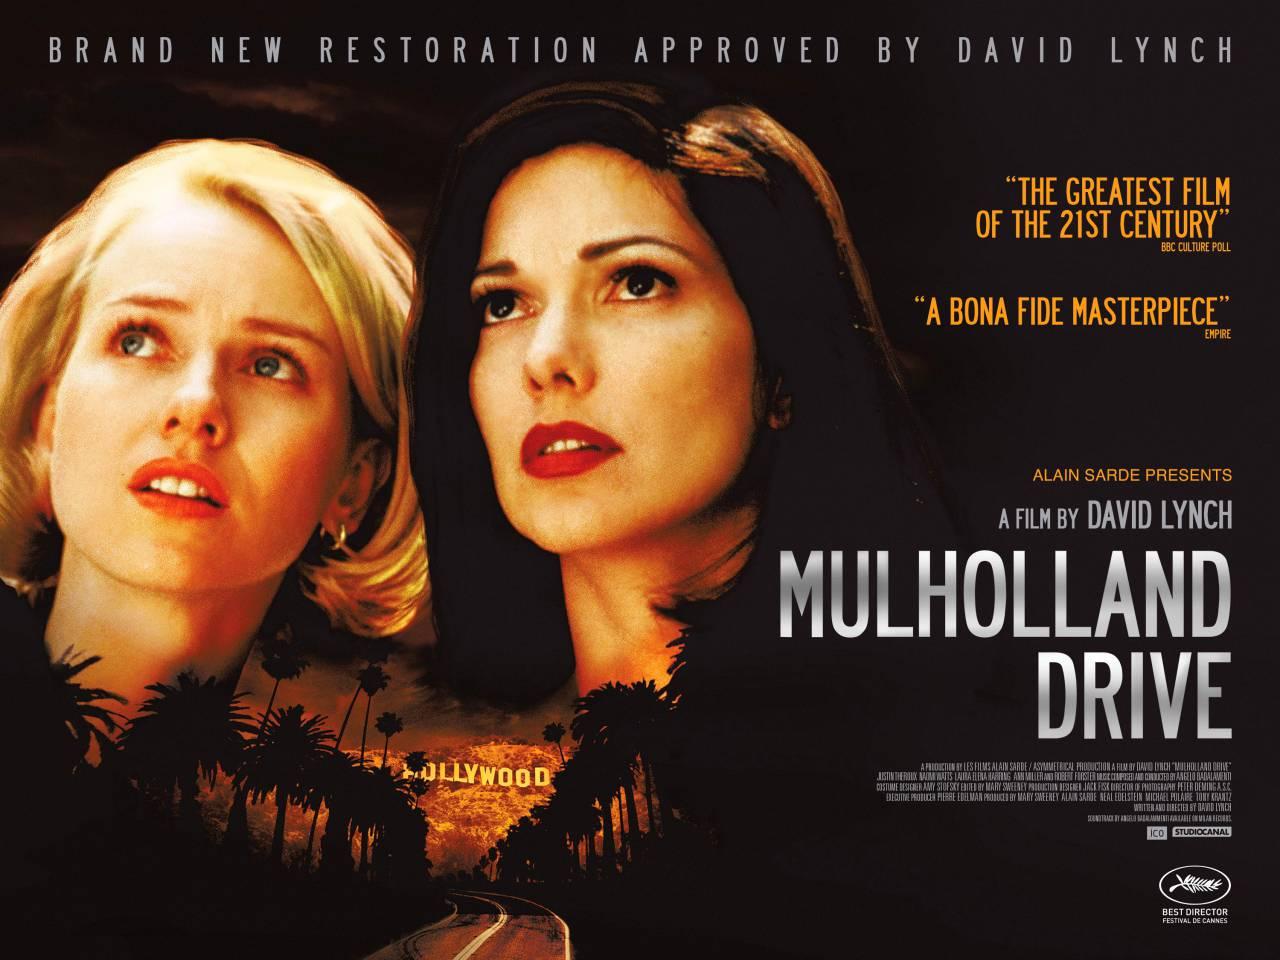 mulholland-drive-restored-poster.jpg